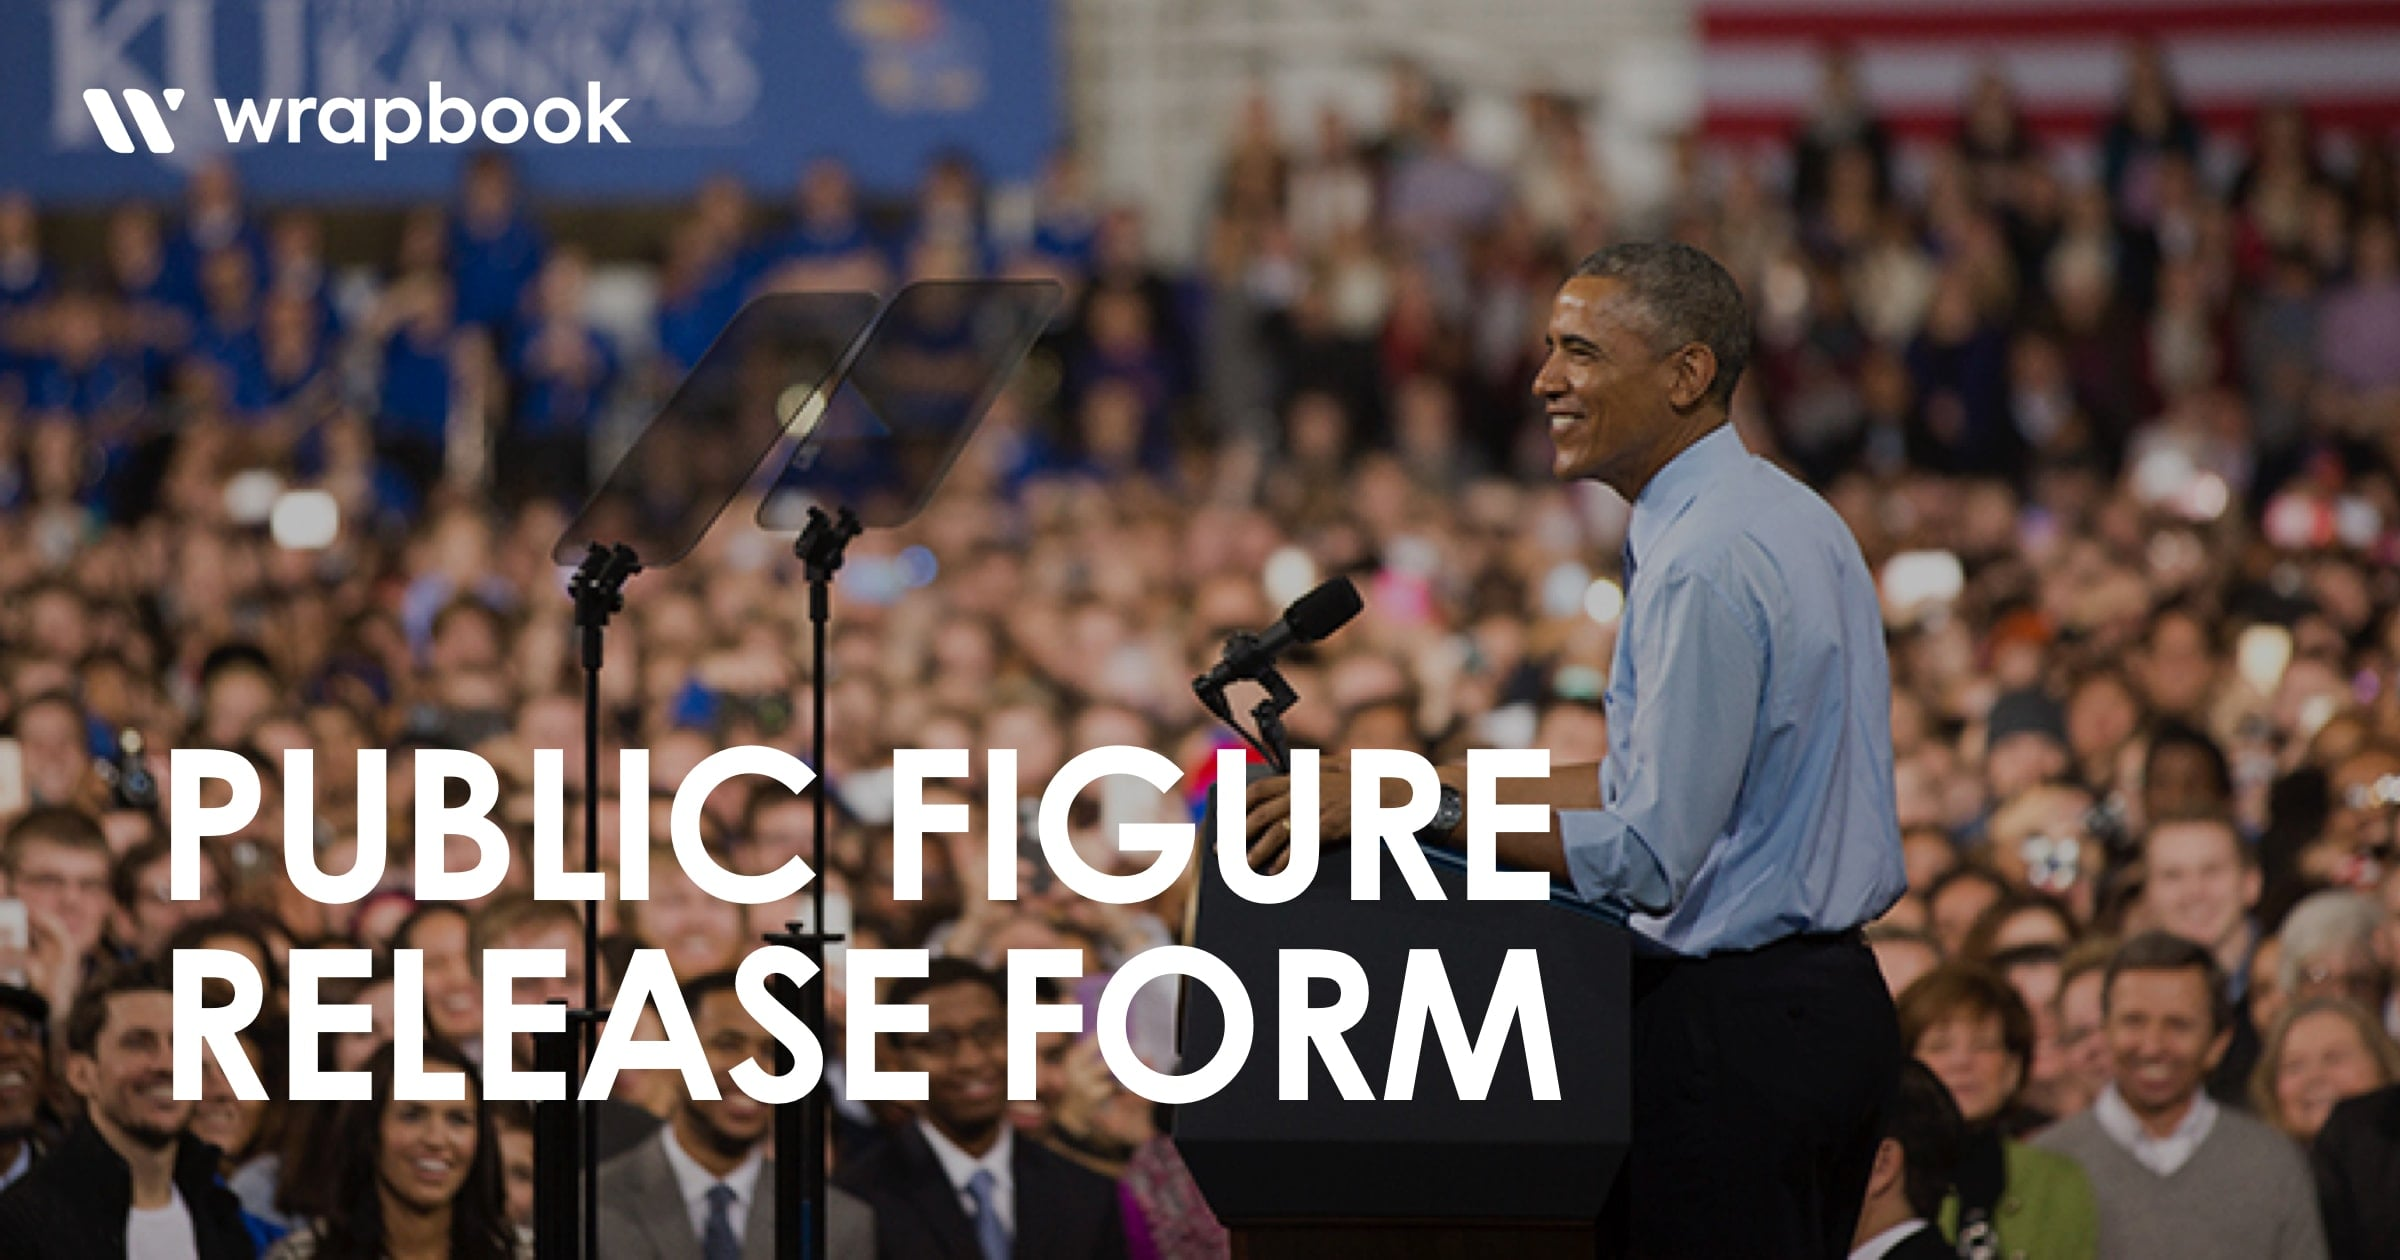 Model Release Form - Public Figure Release - Wrapbook